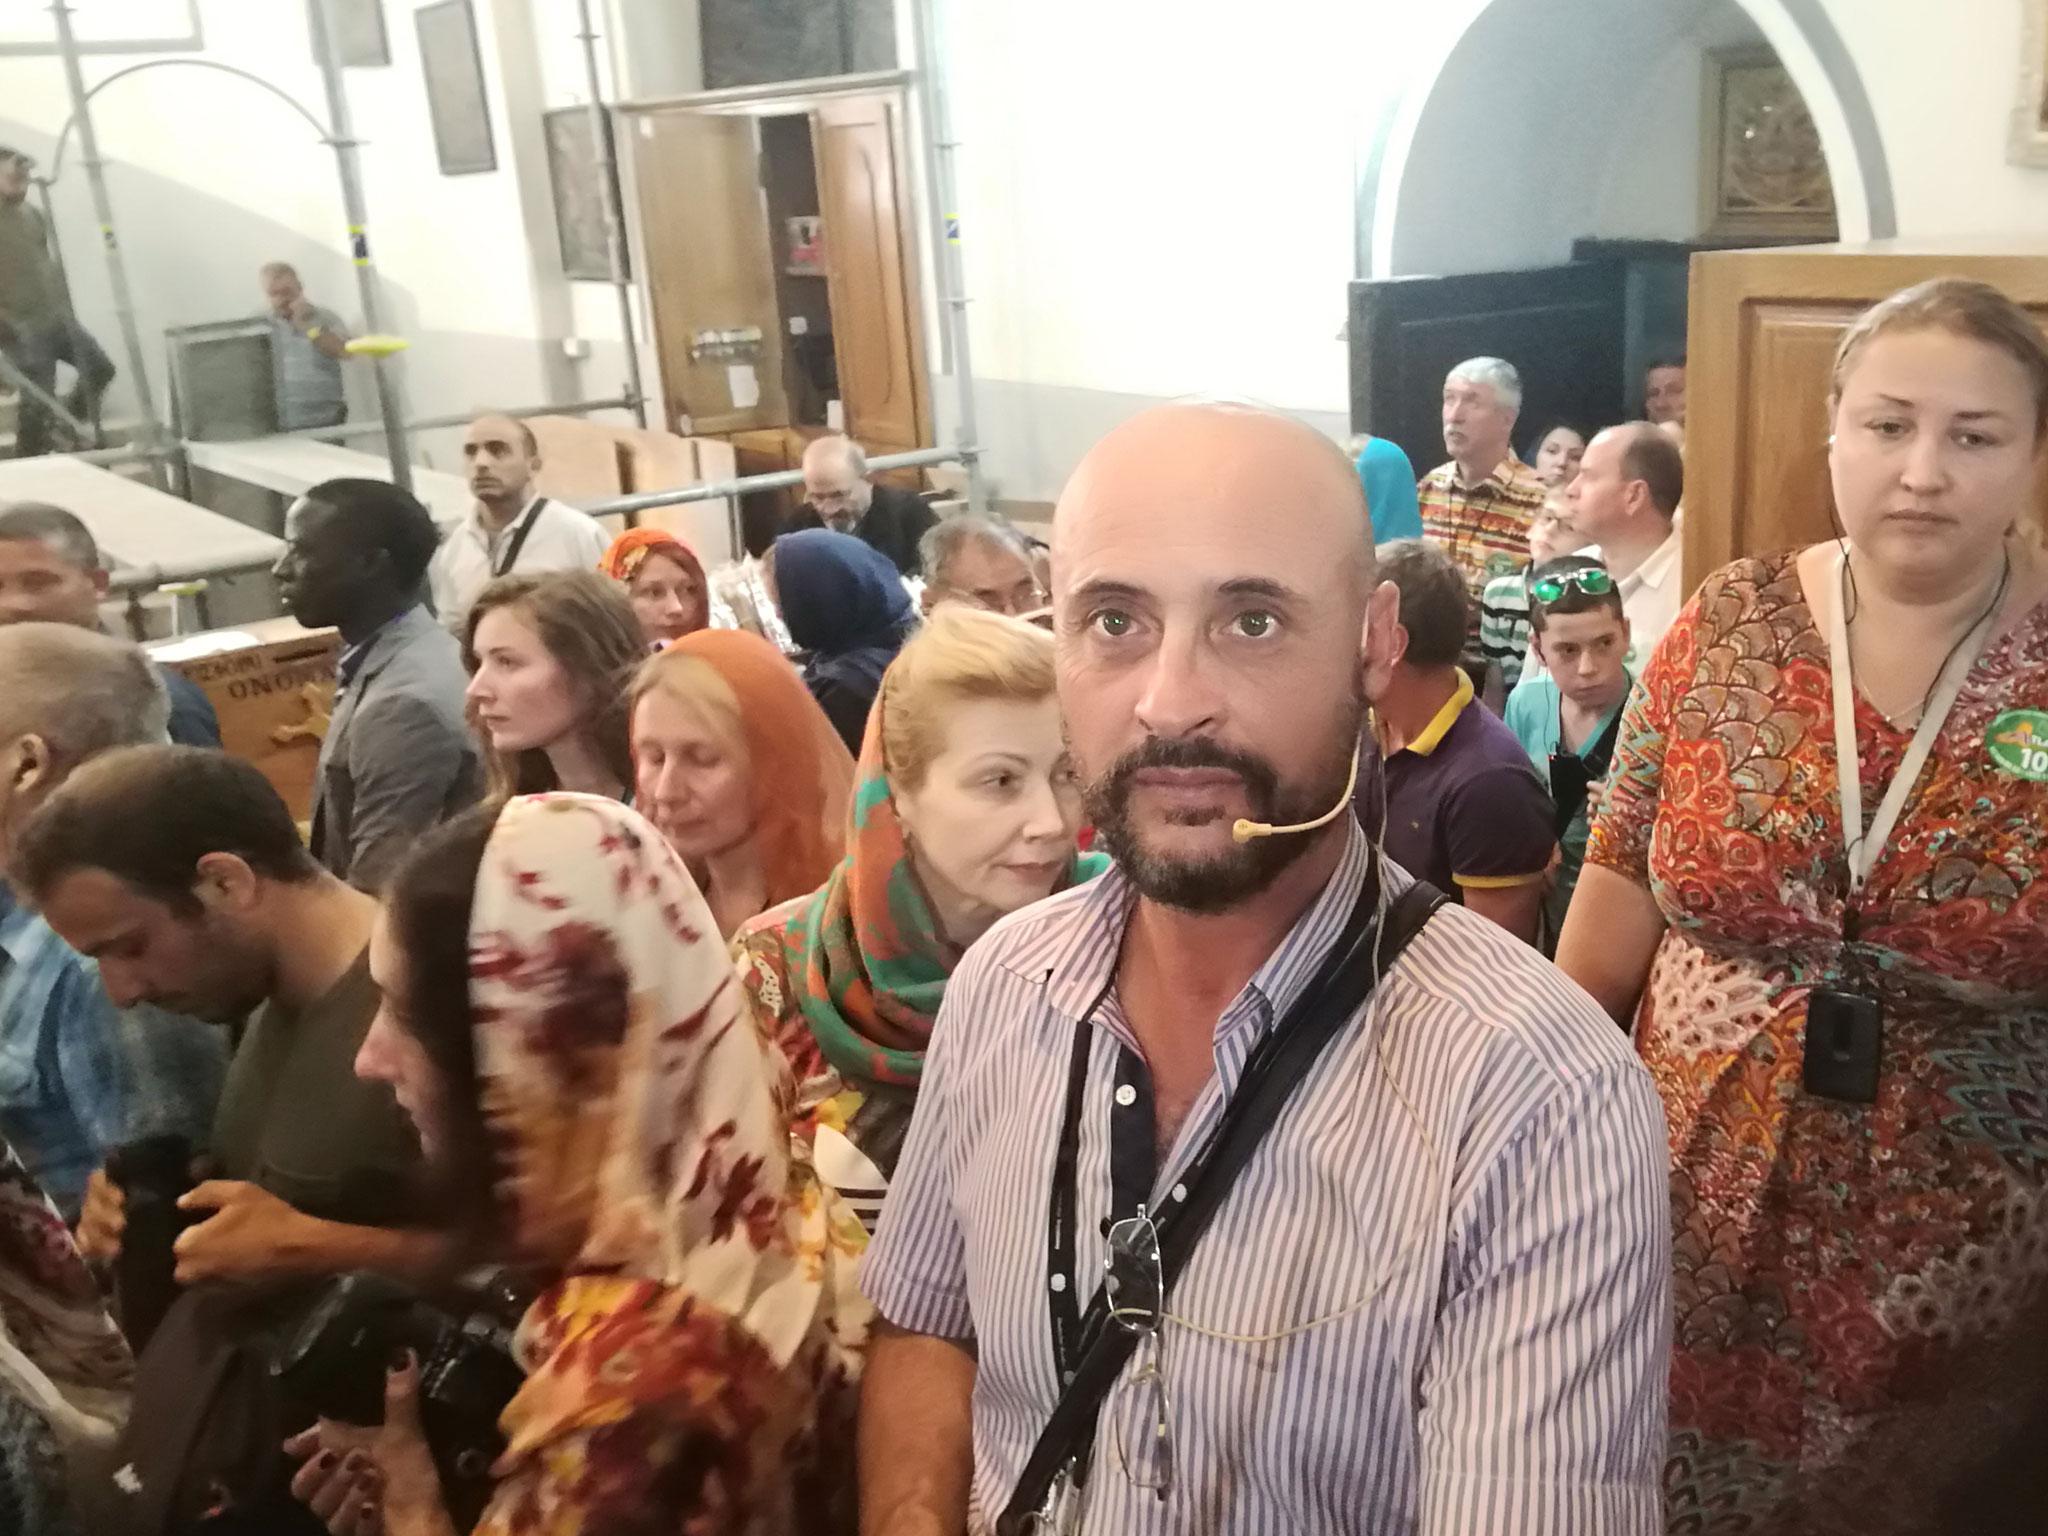 Crowds of pilgrims at the Nativity Church, Bethlehem